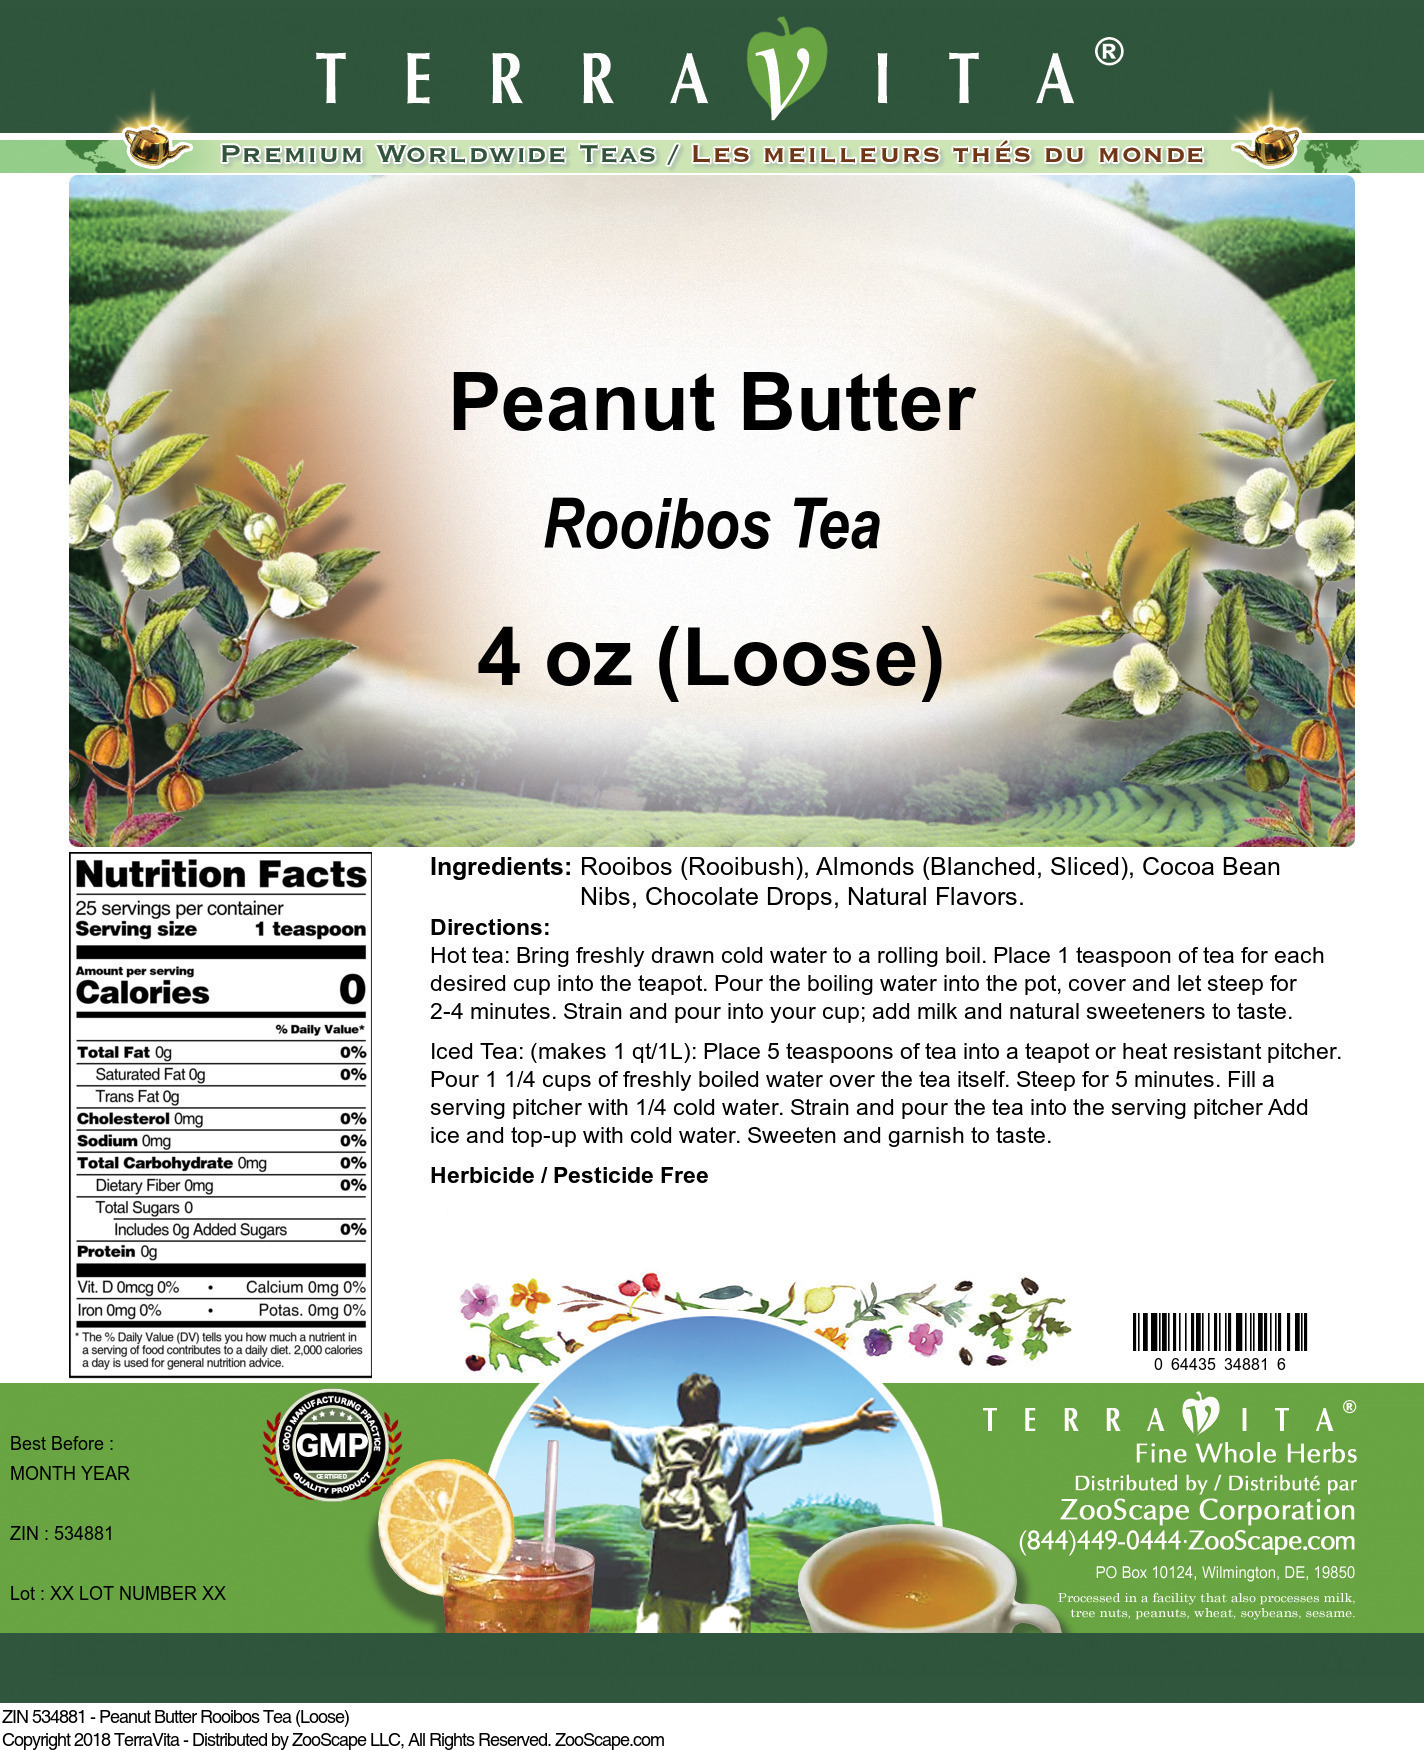 Peanut Butter Rooibos Tea (Loose)